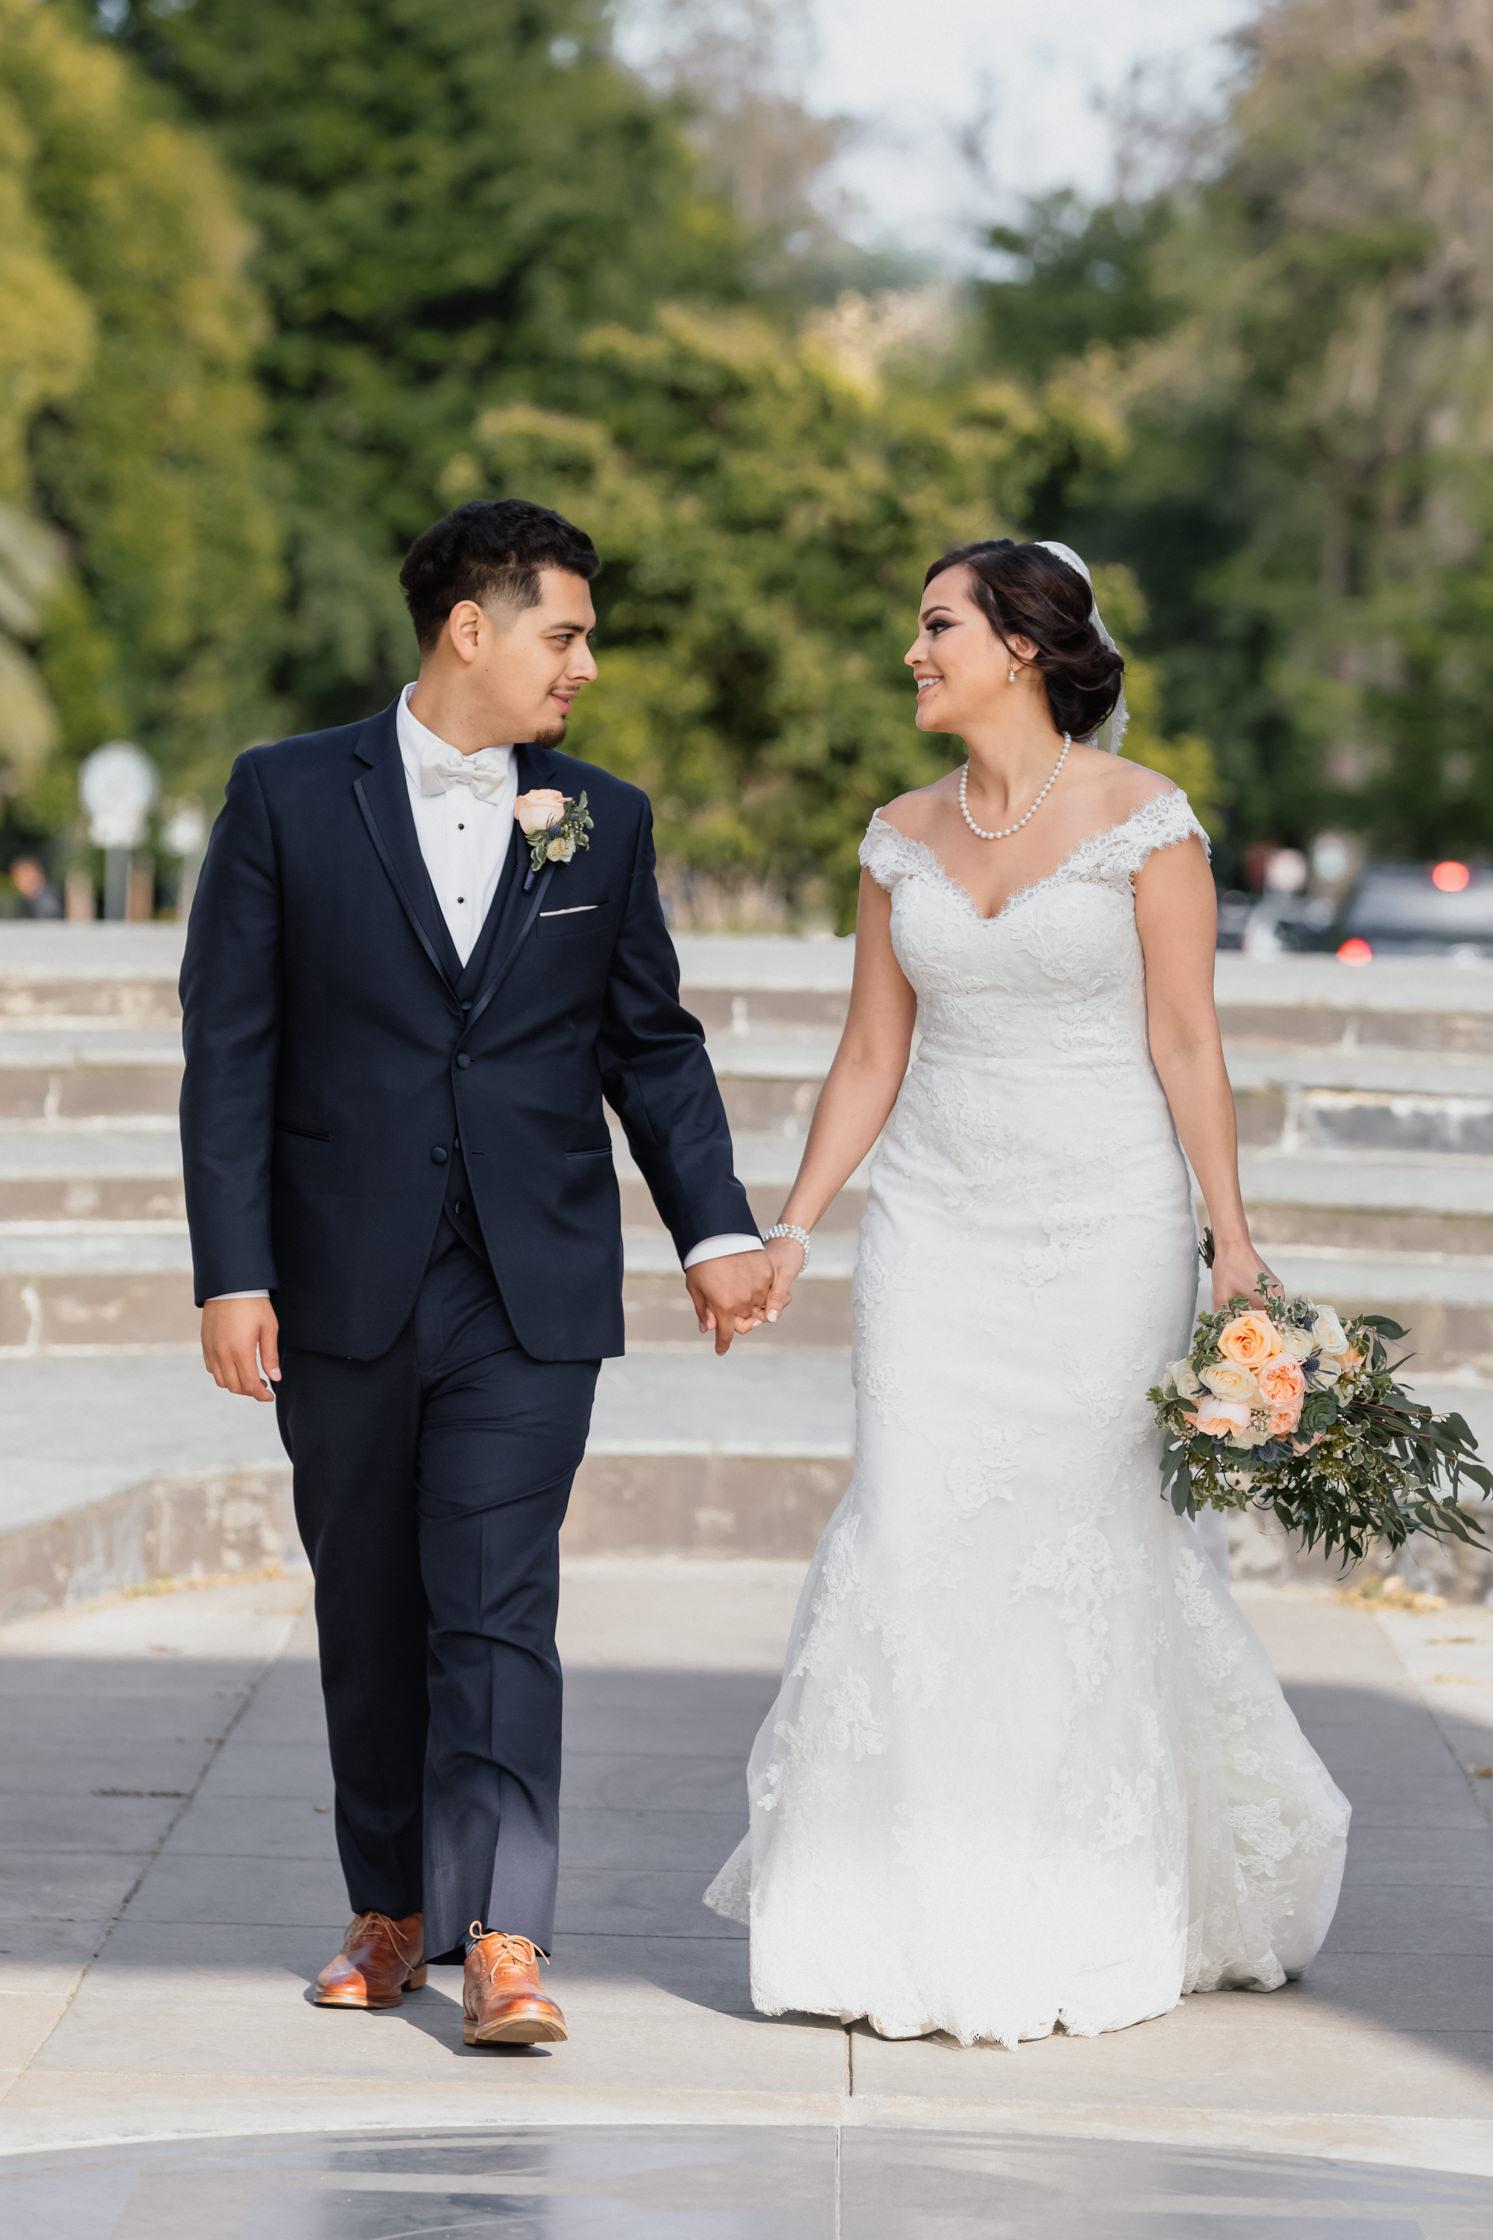 luis_joanna_wedding-63.jpg